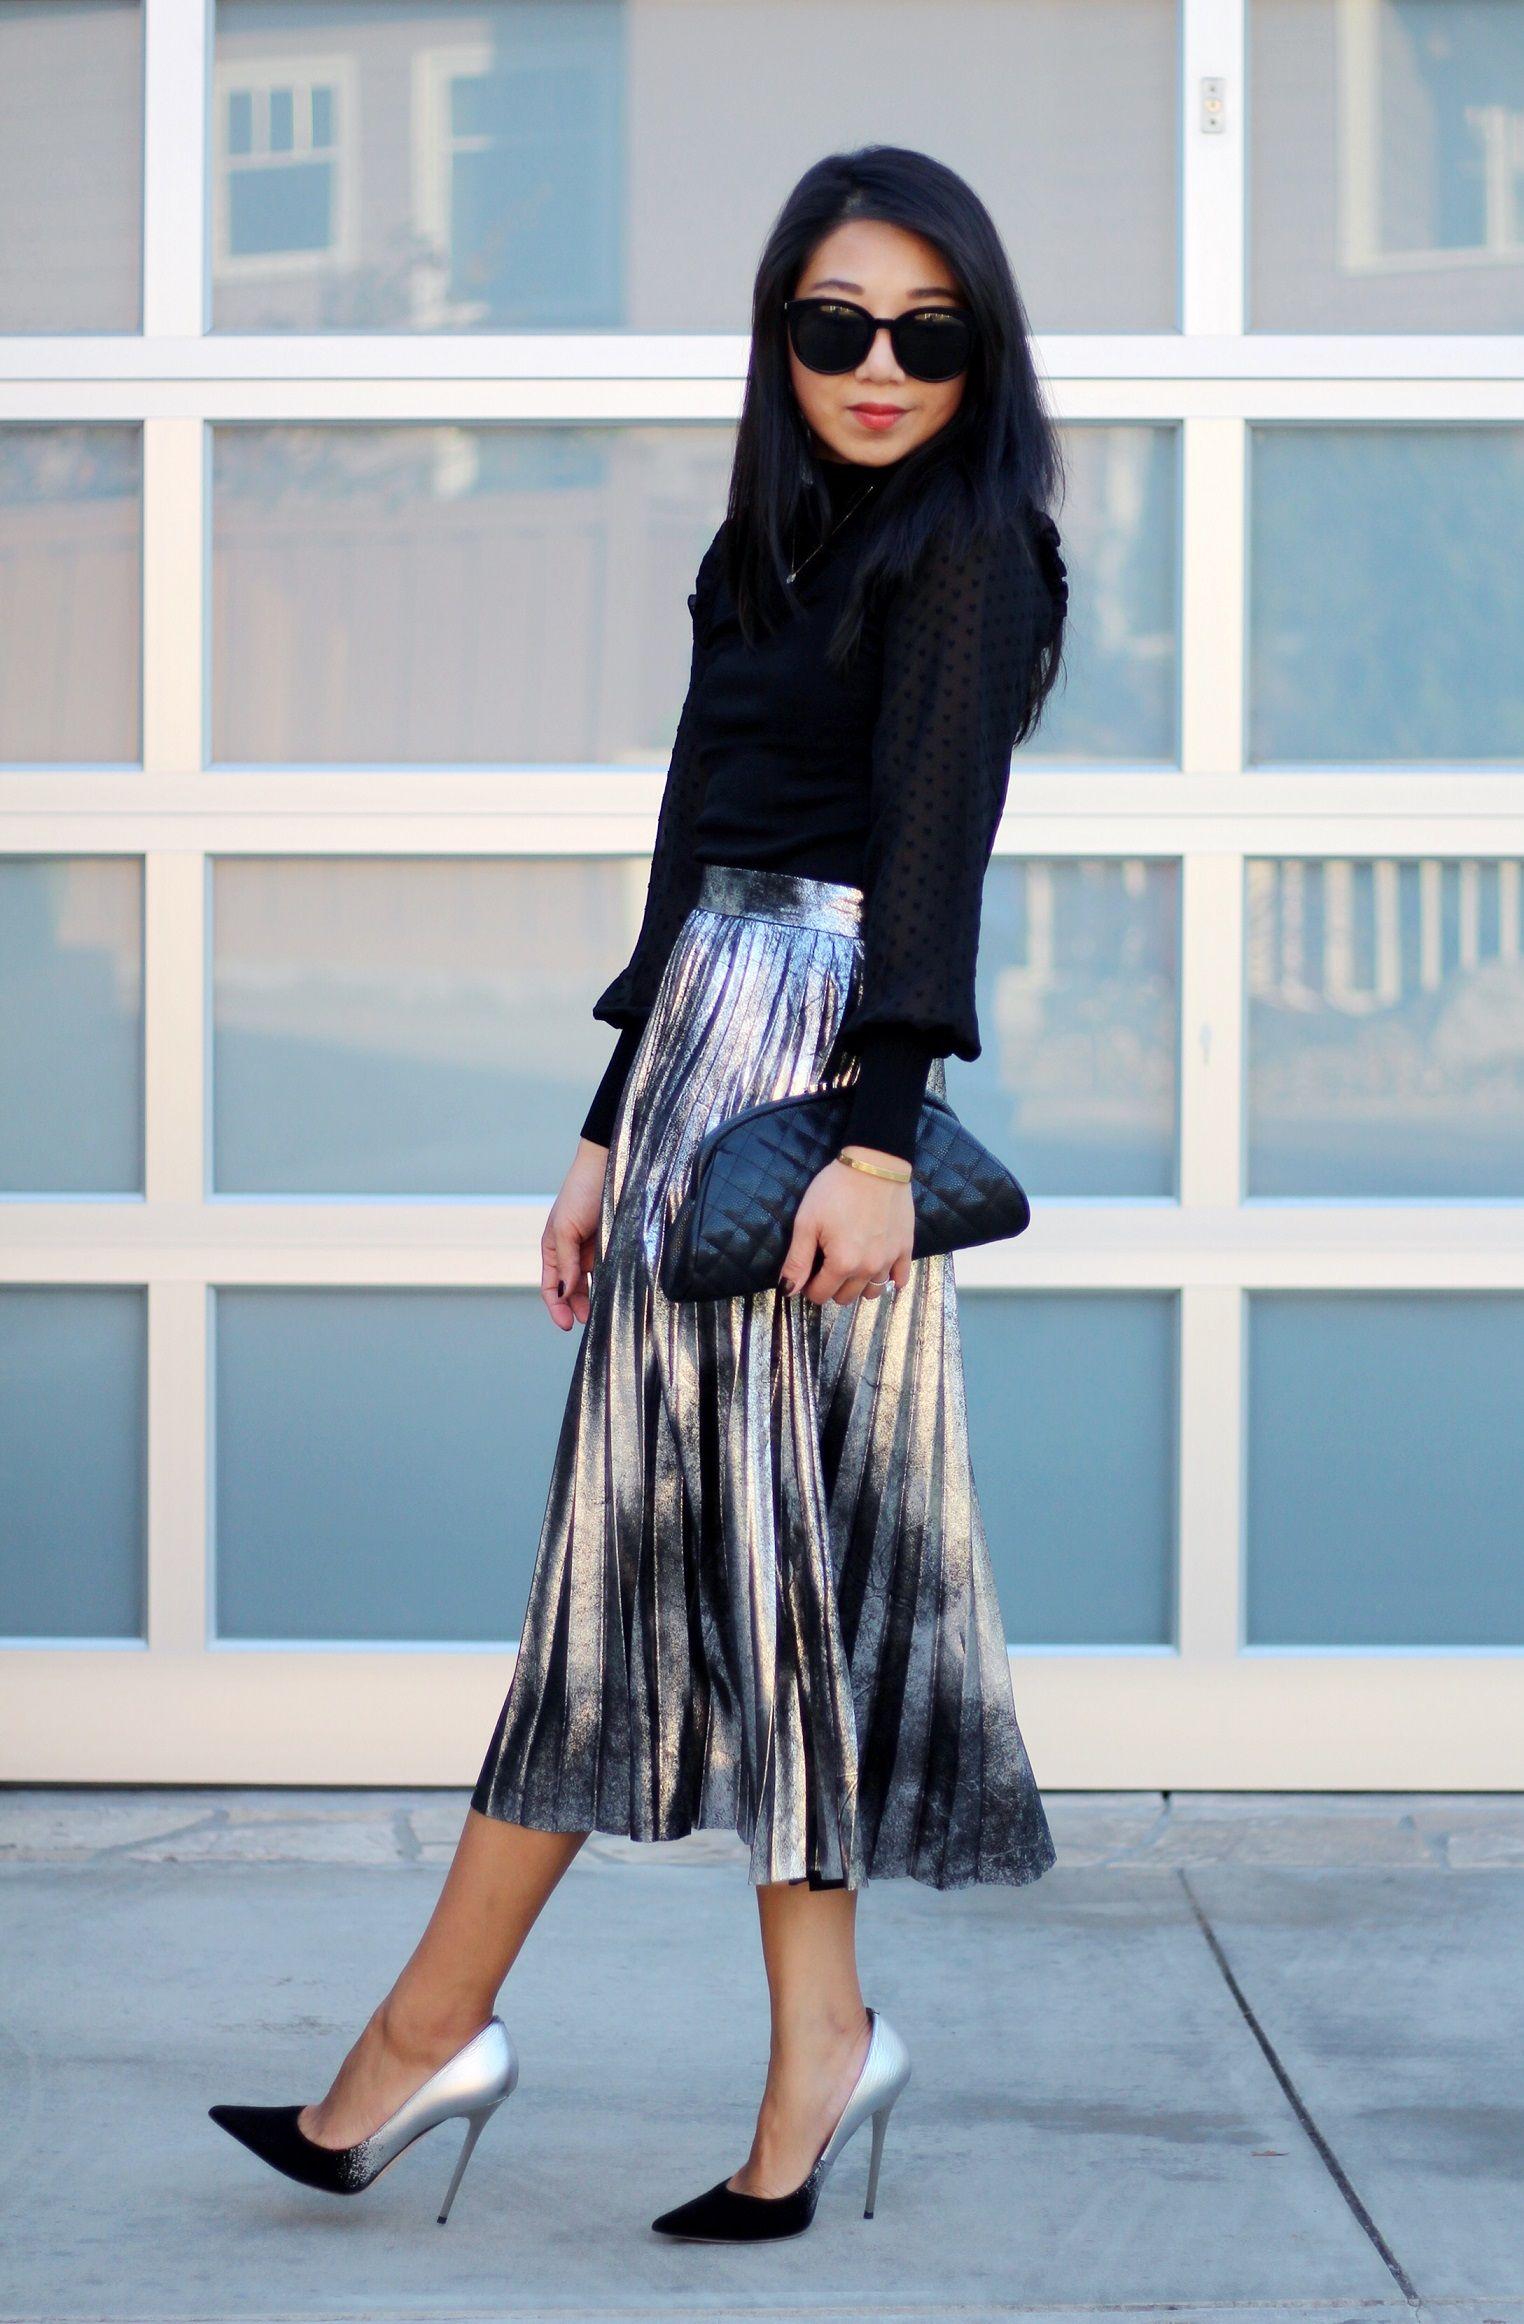 24d198baa5 poshclassymom-holiday-dress-trend-outfits-metallic-pleated-midi-skirt-lace- turtleneck-top-how-to-wear-metallic-jimmy-choo-anouk-degrade-heels-chanel-clutch-  ...